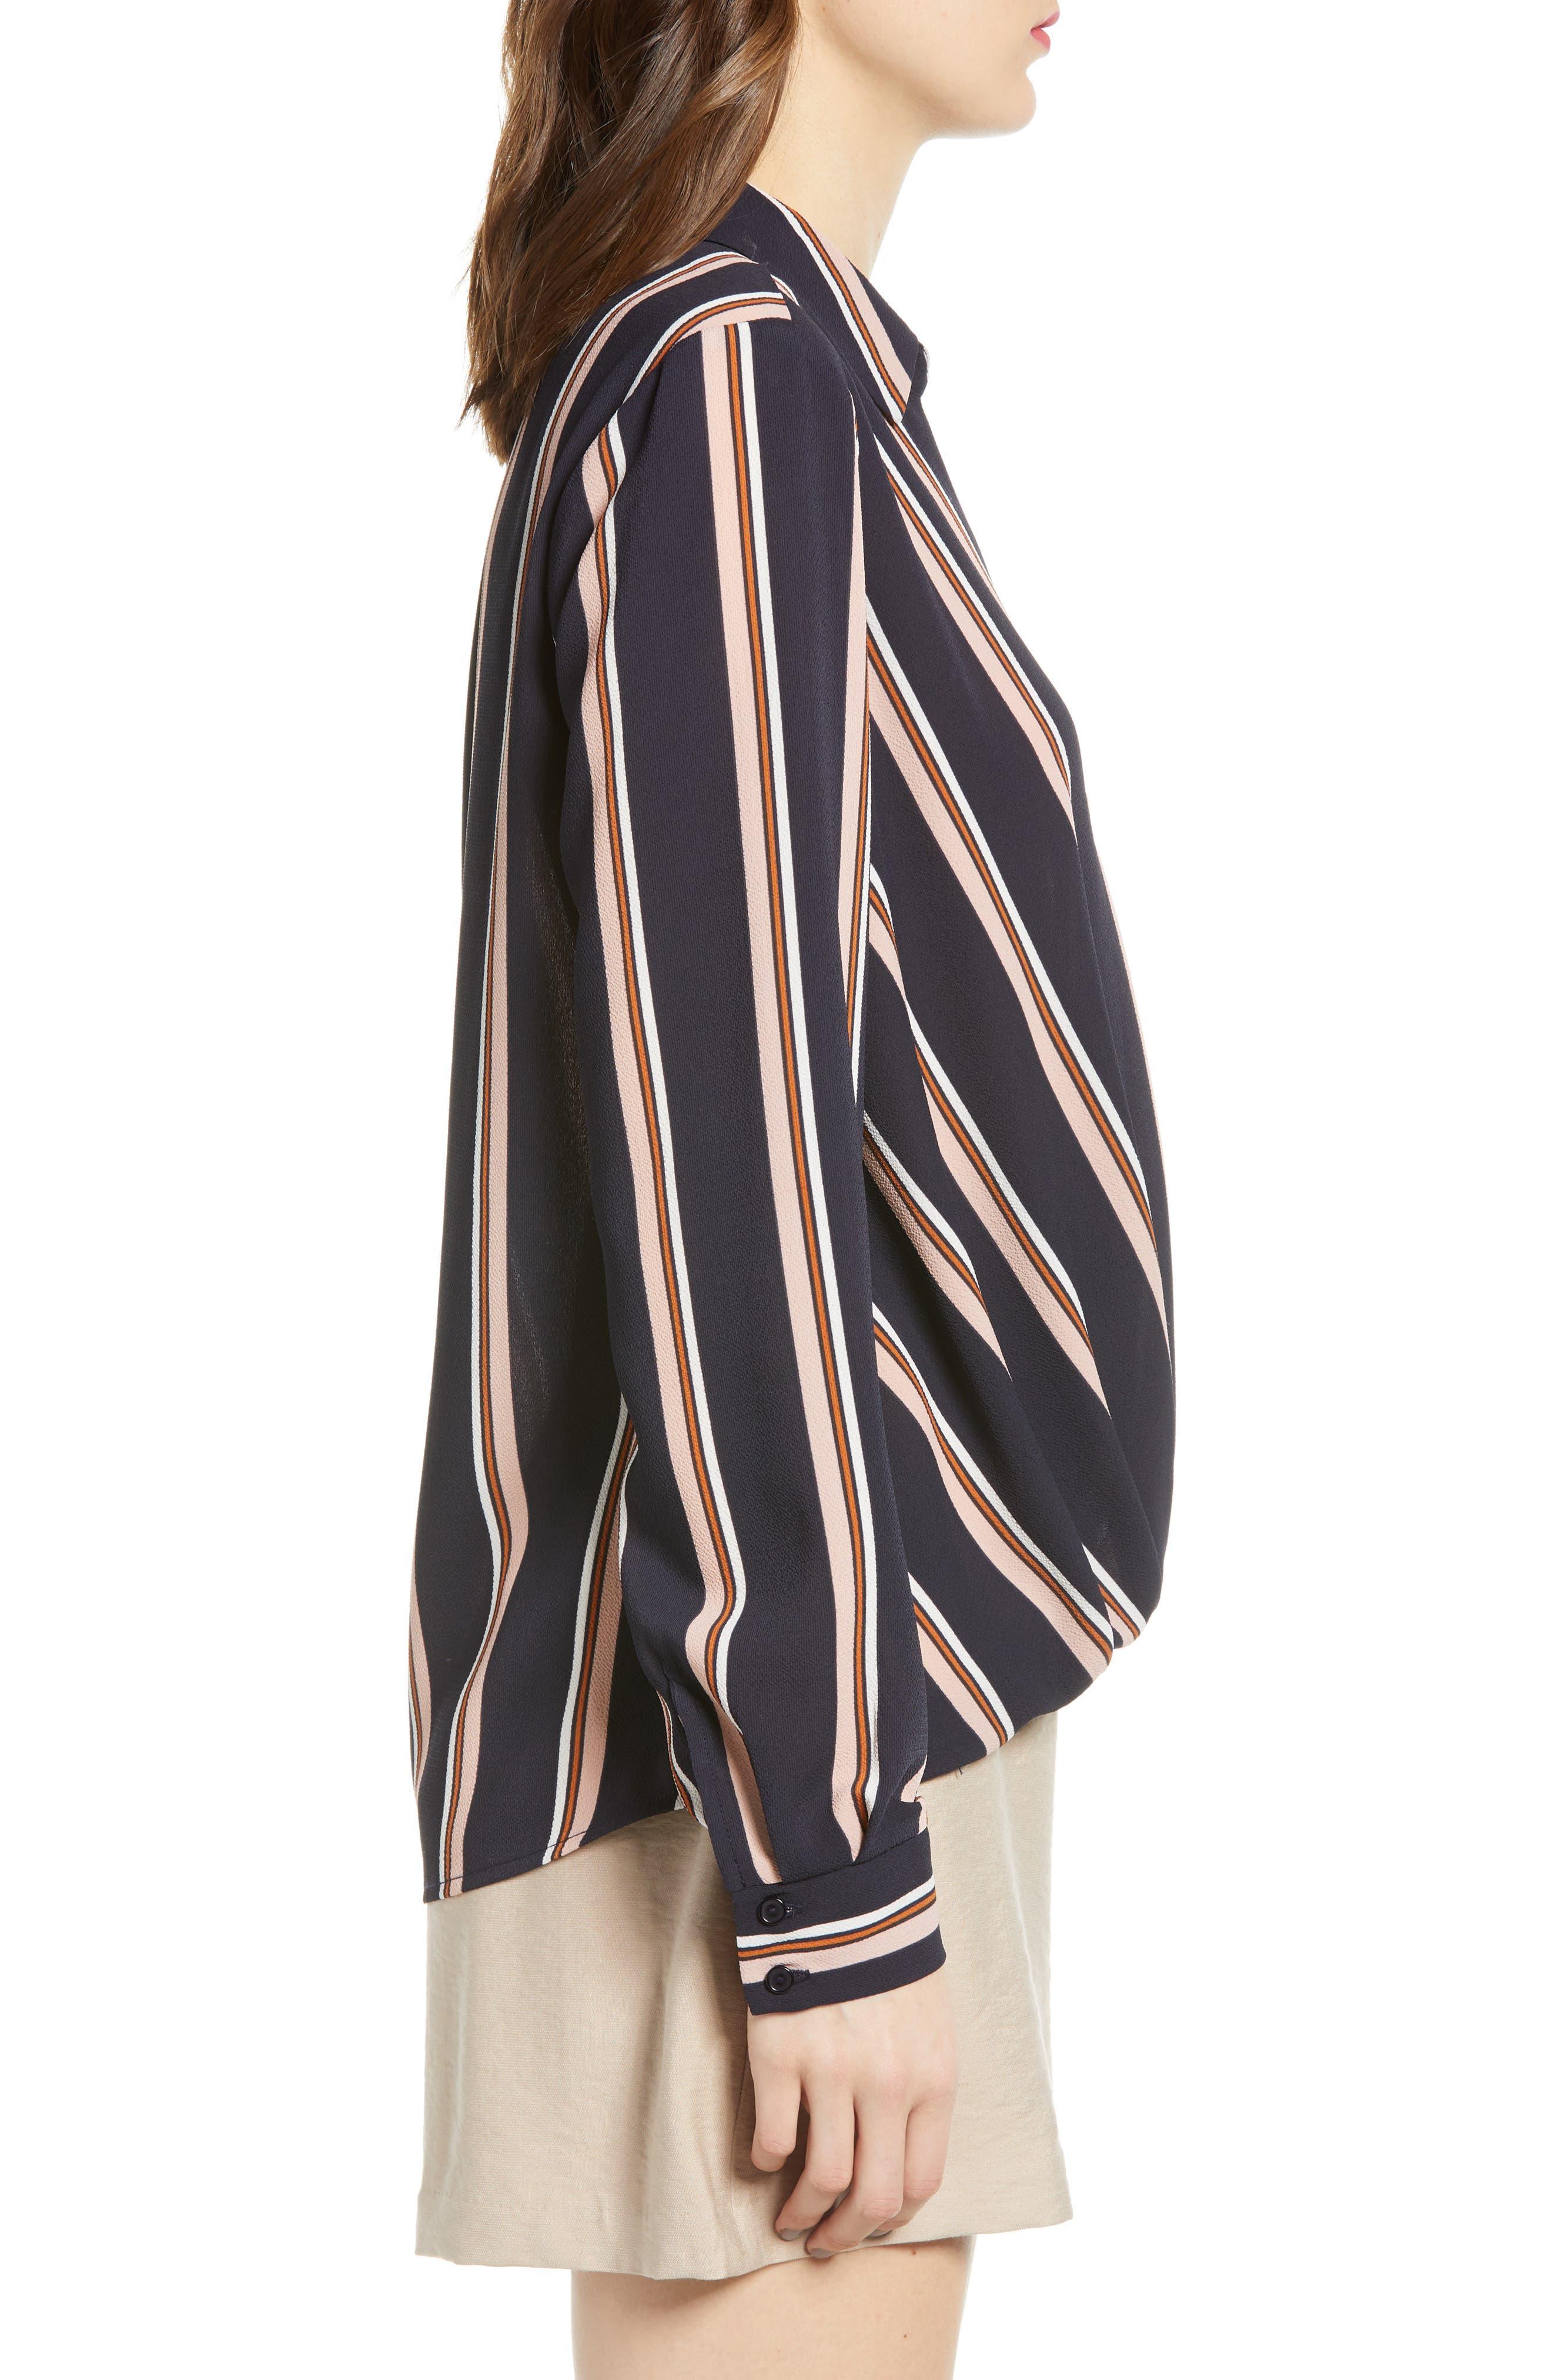 ALL IN FAVOR, Patterned Drape Front Blouse, Alternate thumbnail 3, color, NAVY STRIPE